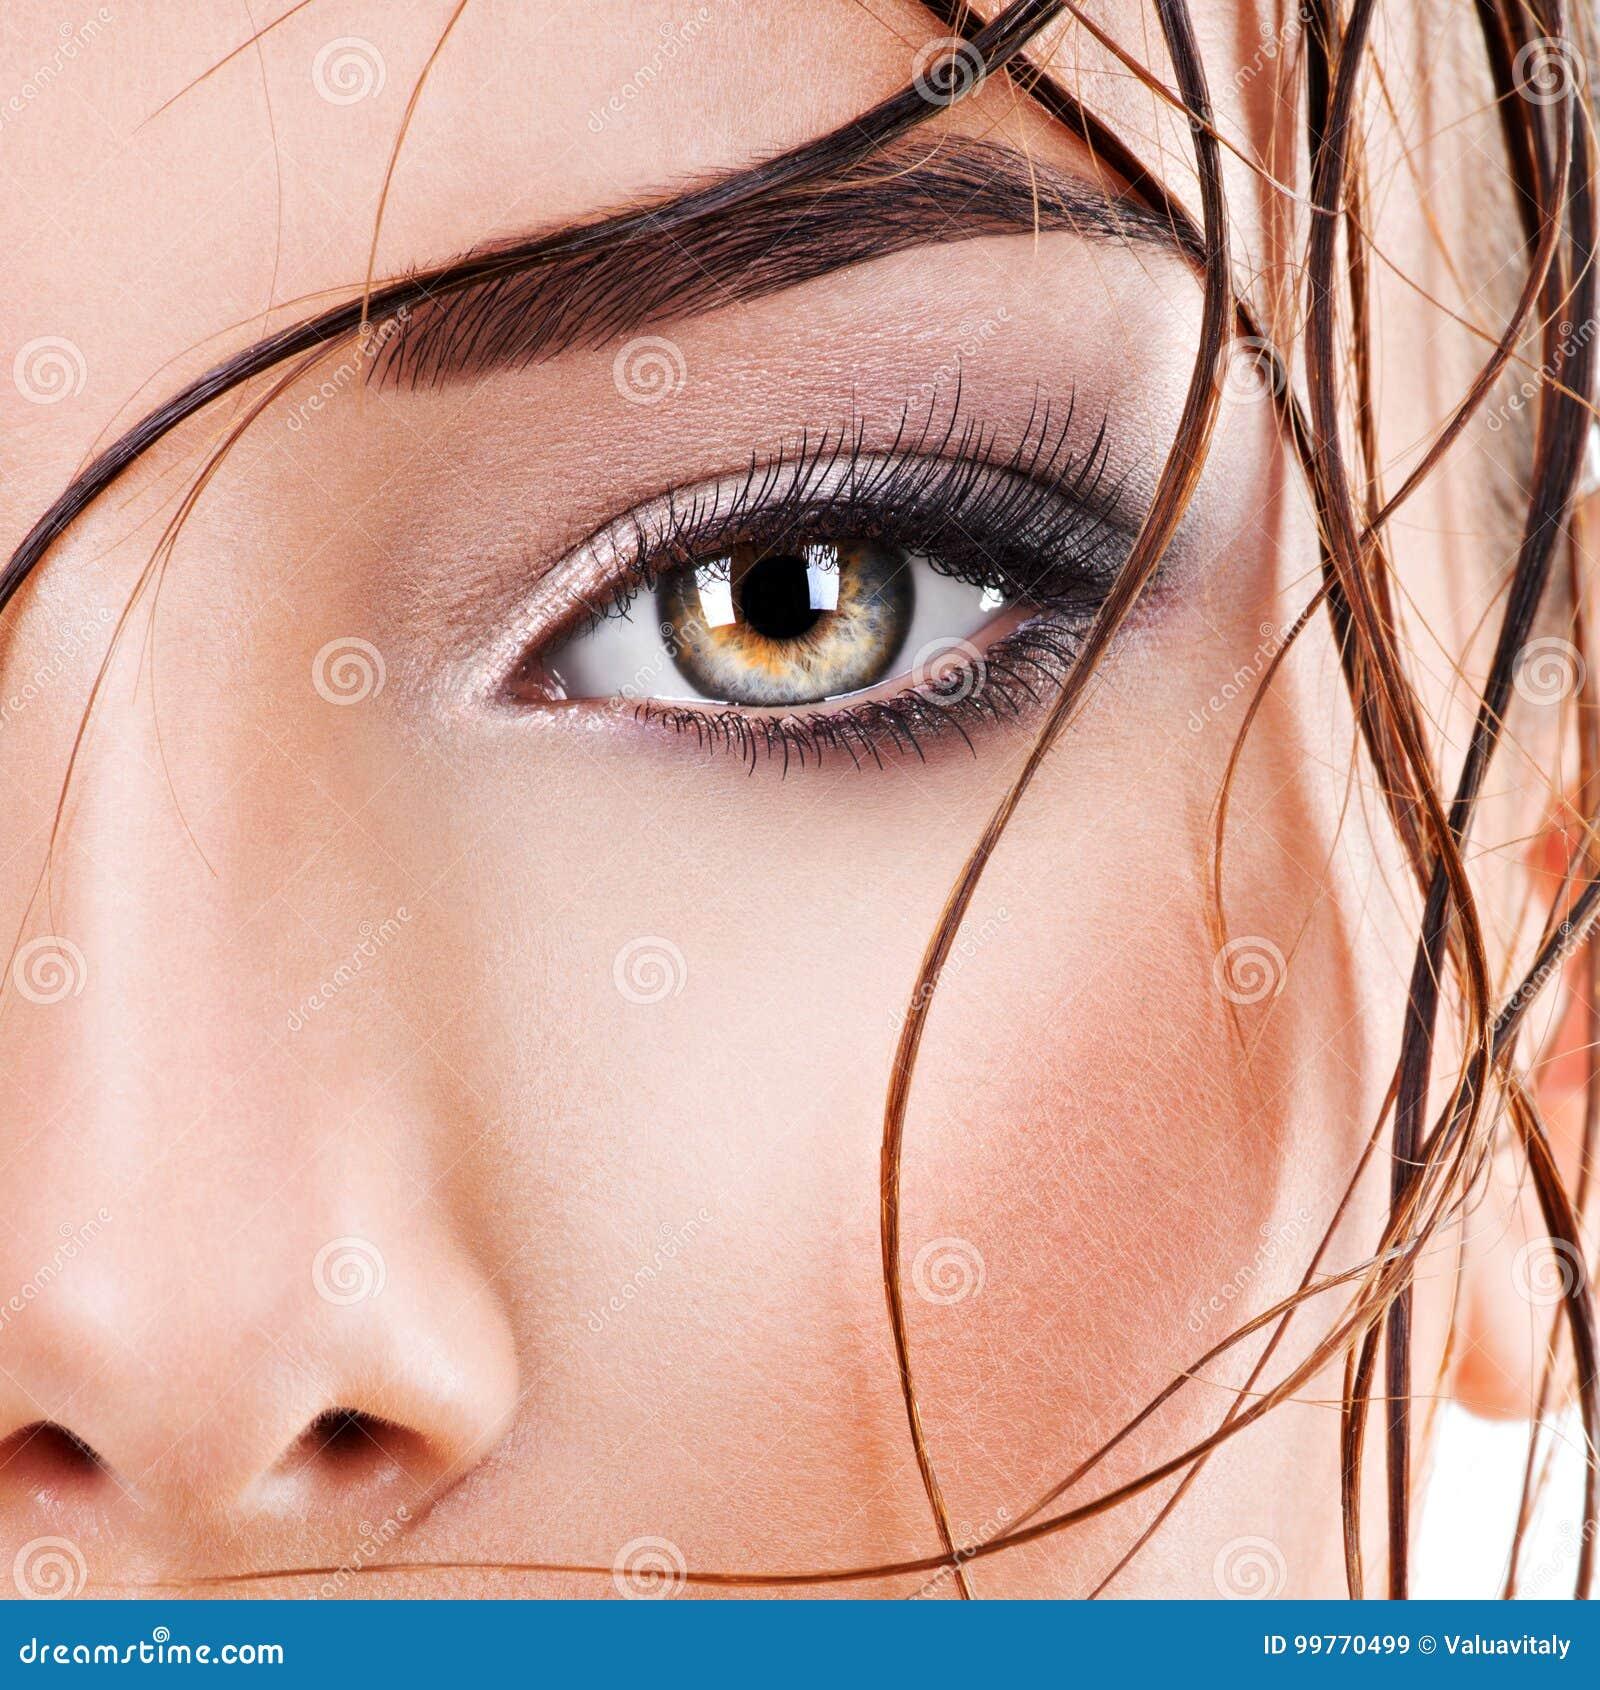 Closeup Female Eye With Dark Brown Eye Makeup Stock Image Image Of